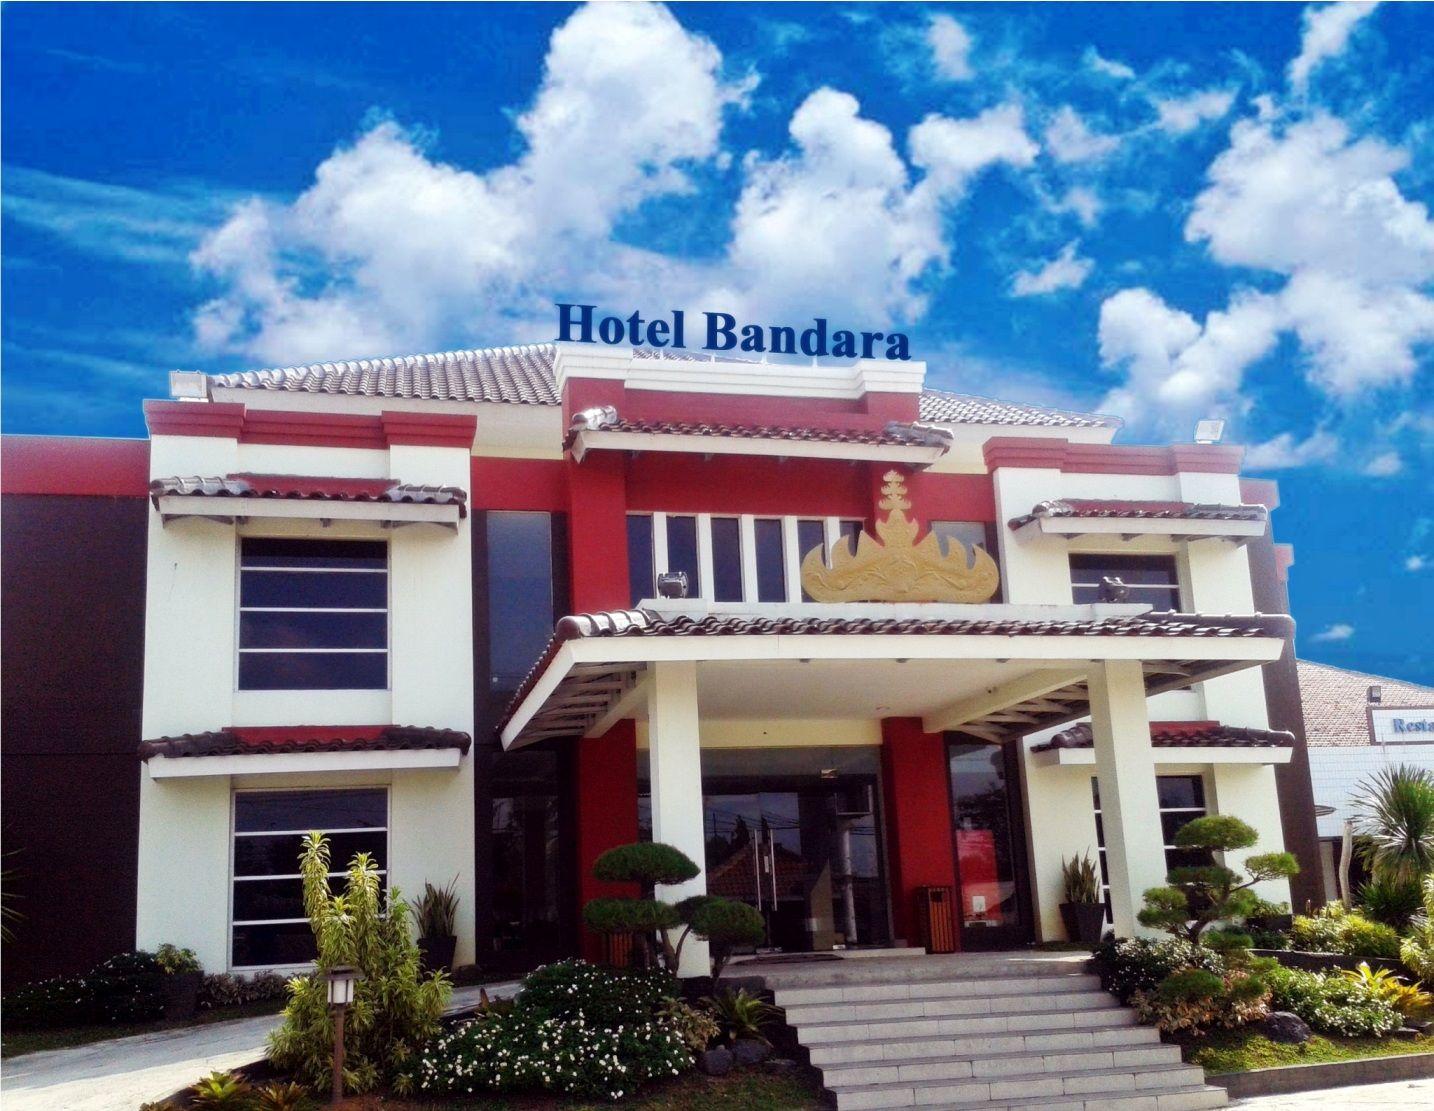 Hotel Bandara Syariah Lampung,Bandar Lampung